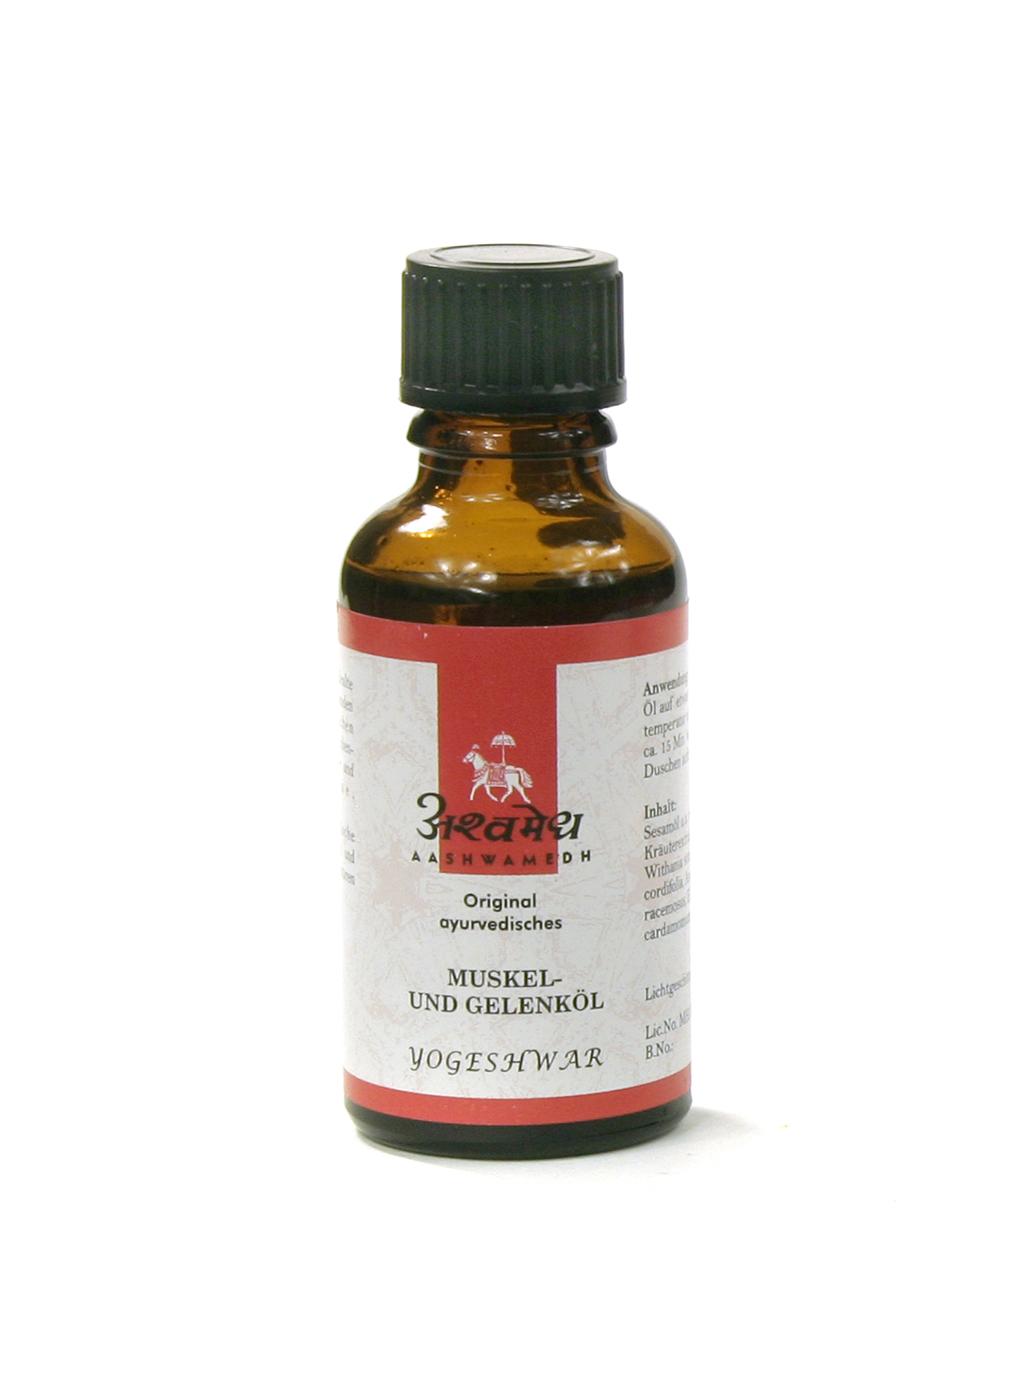 Muskel- & Gelenköl, Yogeshwar 30 ml.